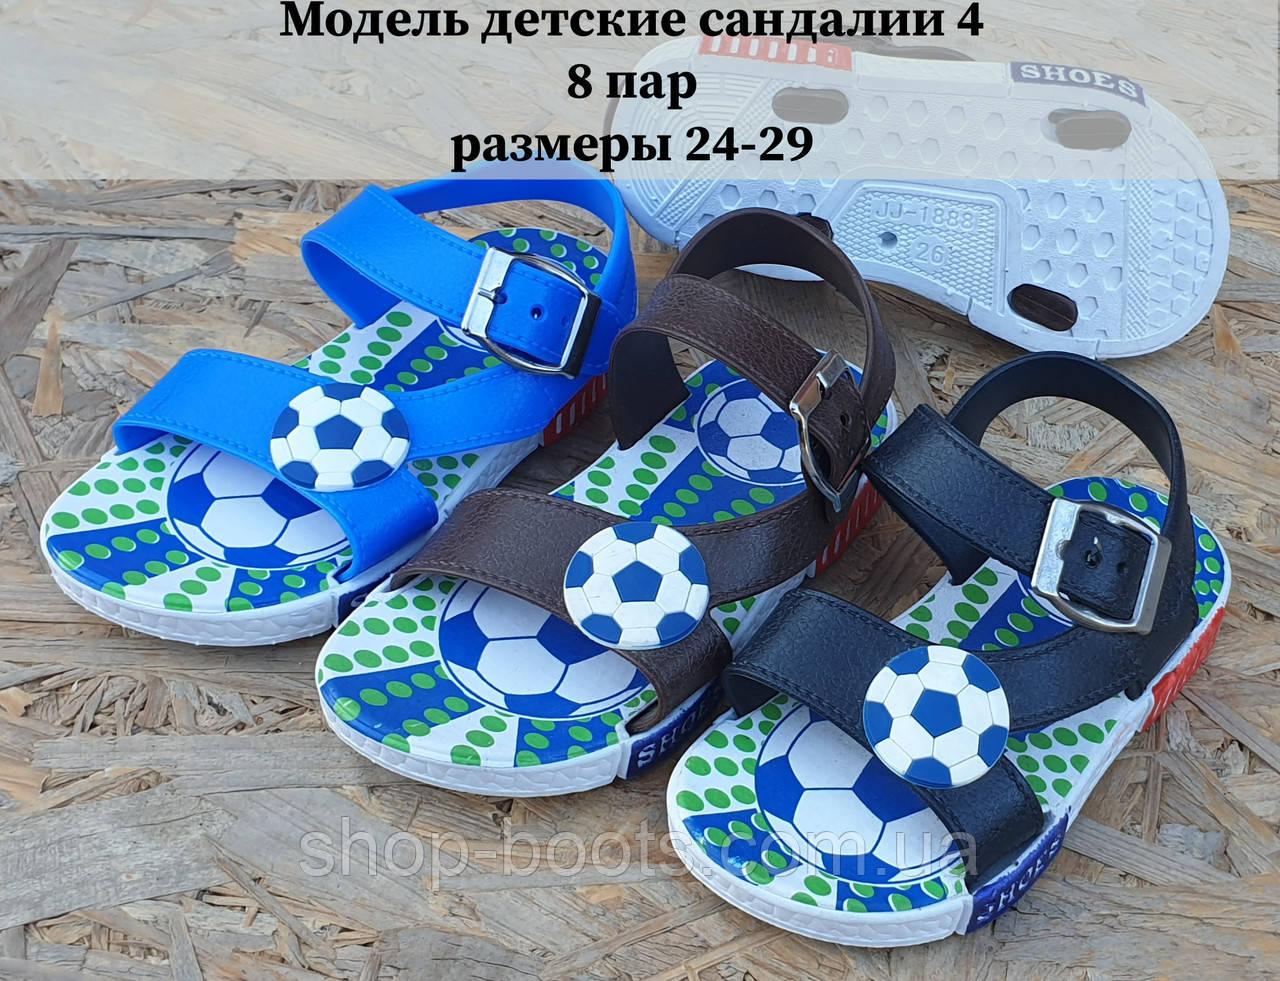 Детские сандалии оптом. 24-29рр. Модель детские сандалии 4